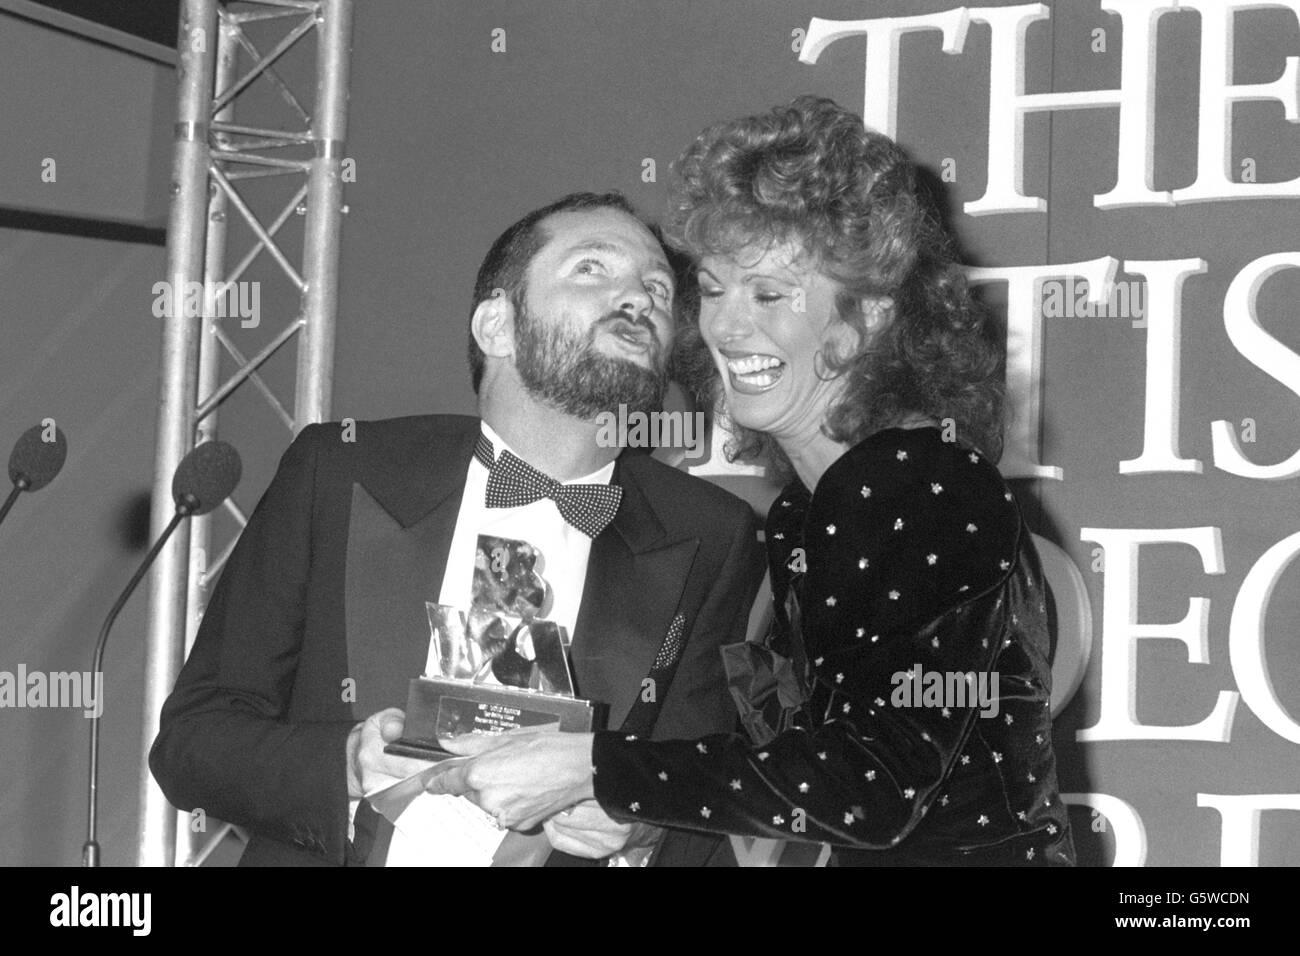 Entertainment - Kenny Everett and Lizzie Webb - British Video Awards Dinner - Grosvenor House Hotel, London - Stock Image